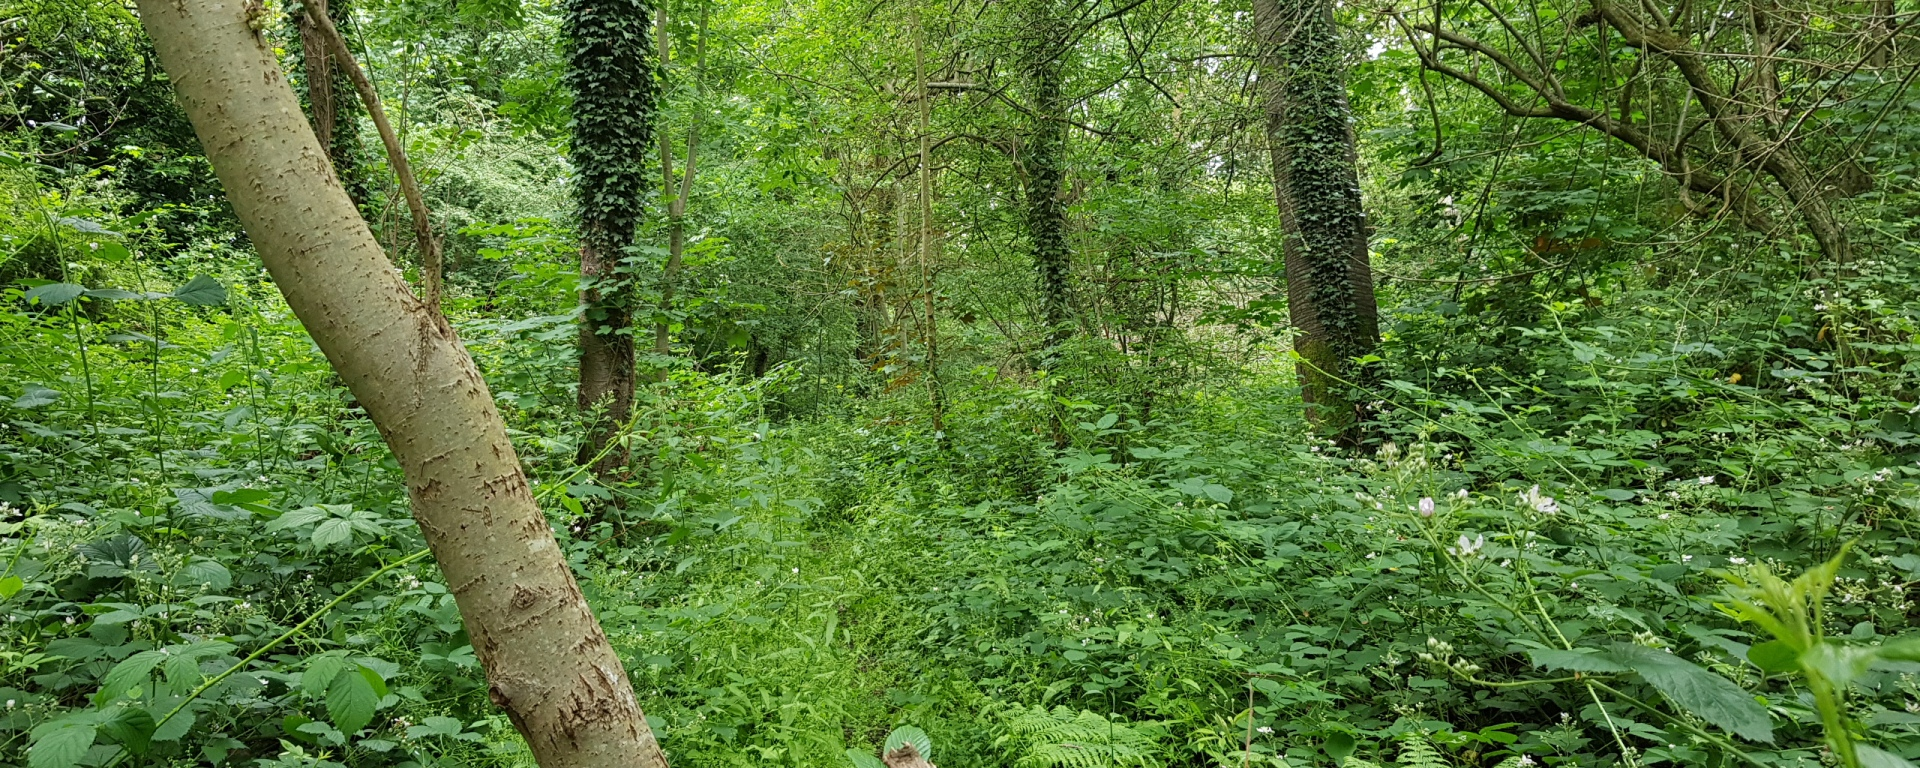 hemwood dell trees